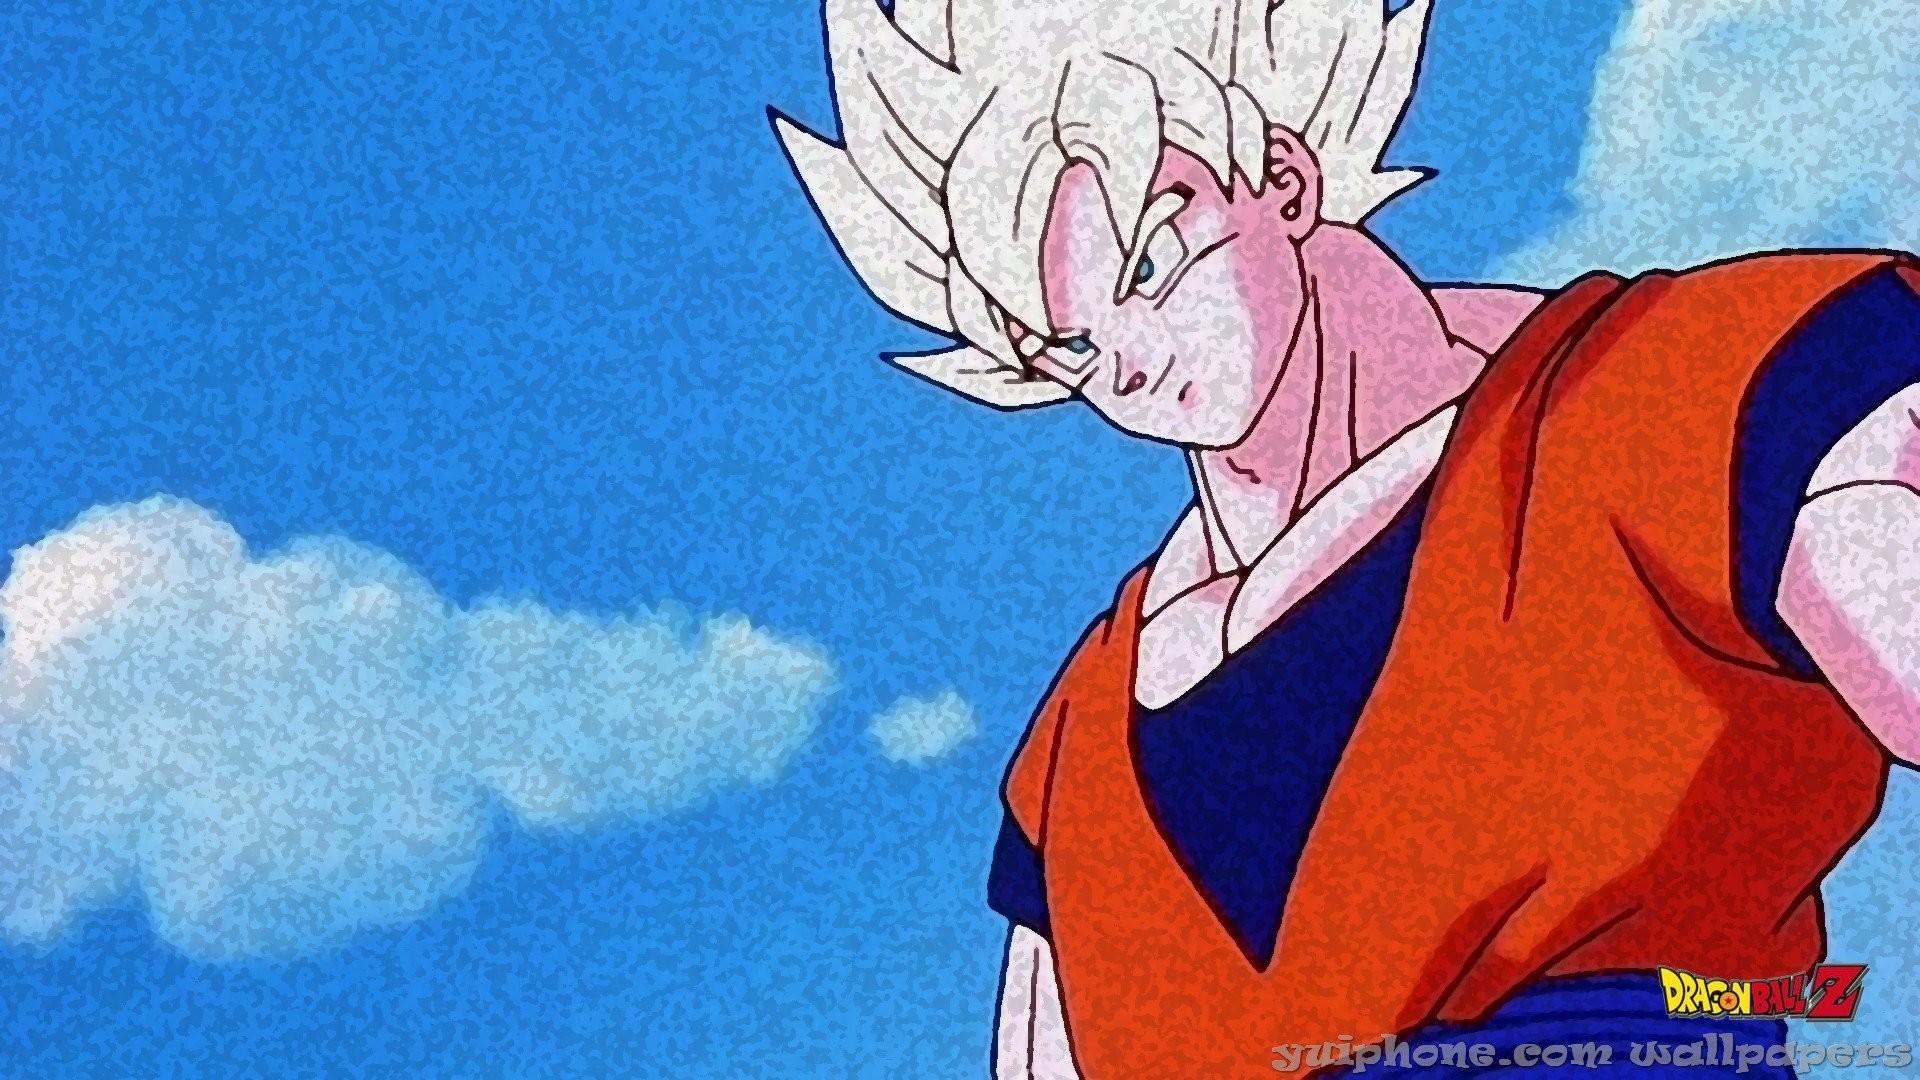 Gallery of Dragon Ball Z Wallpaper Goku Super Saiyan 3